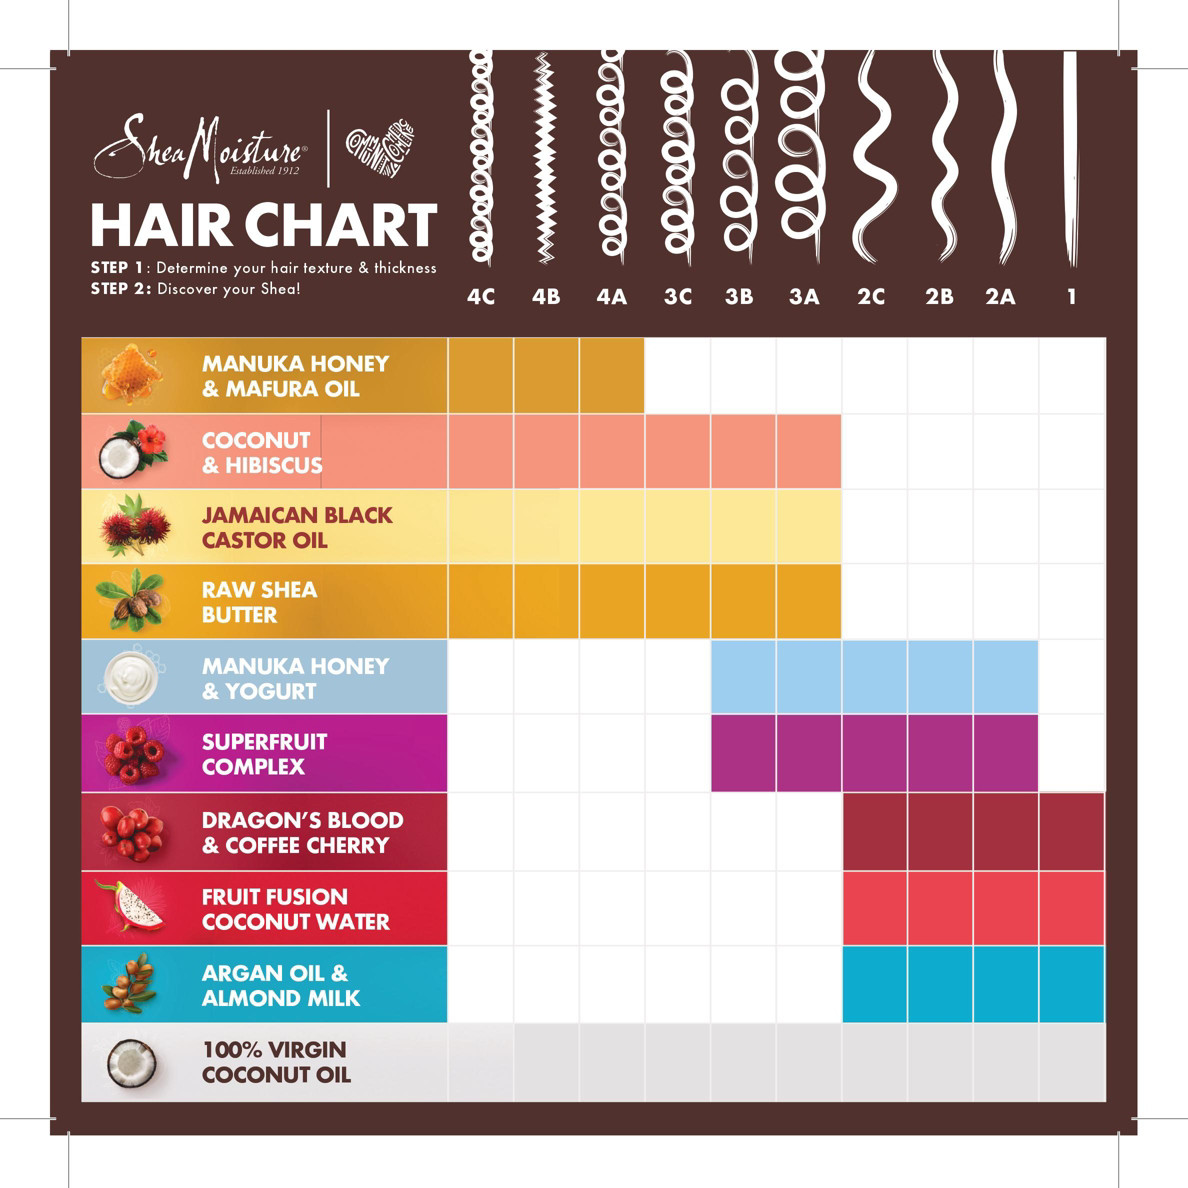 shea-moisture-hair-chart